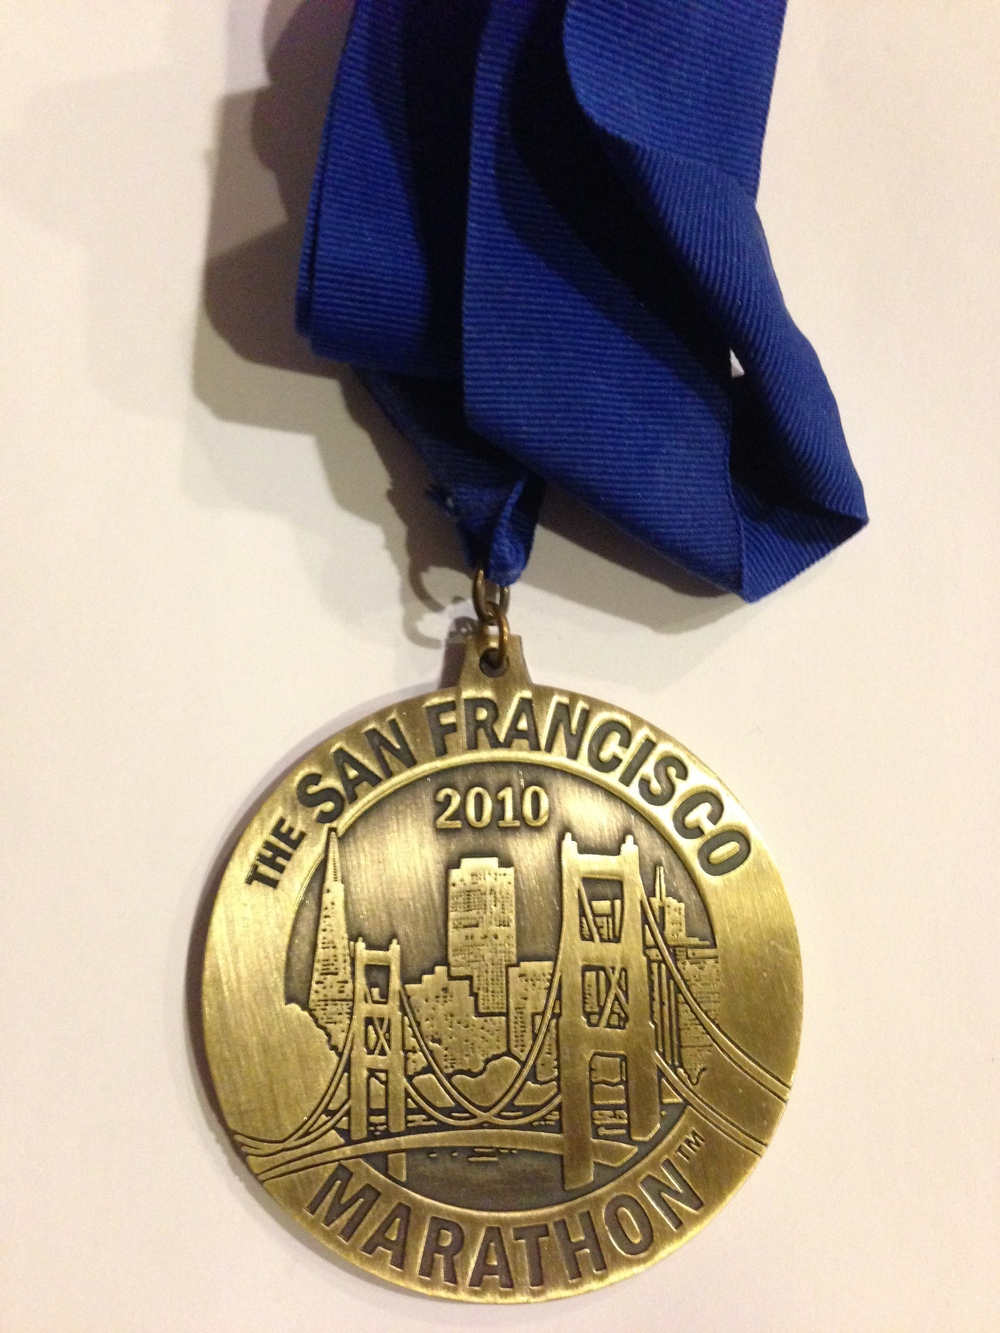 SAN FRANCISCO MARATHON MEDAL